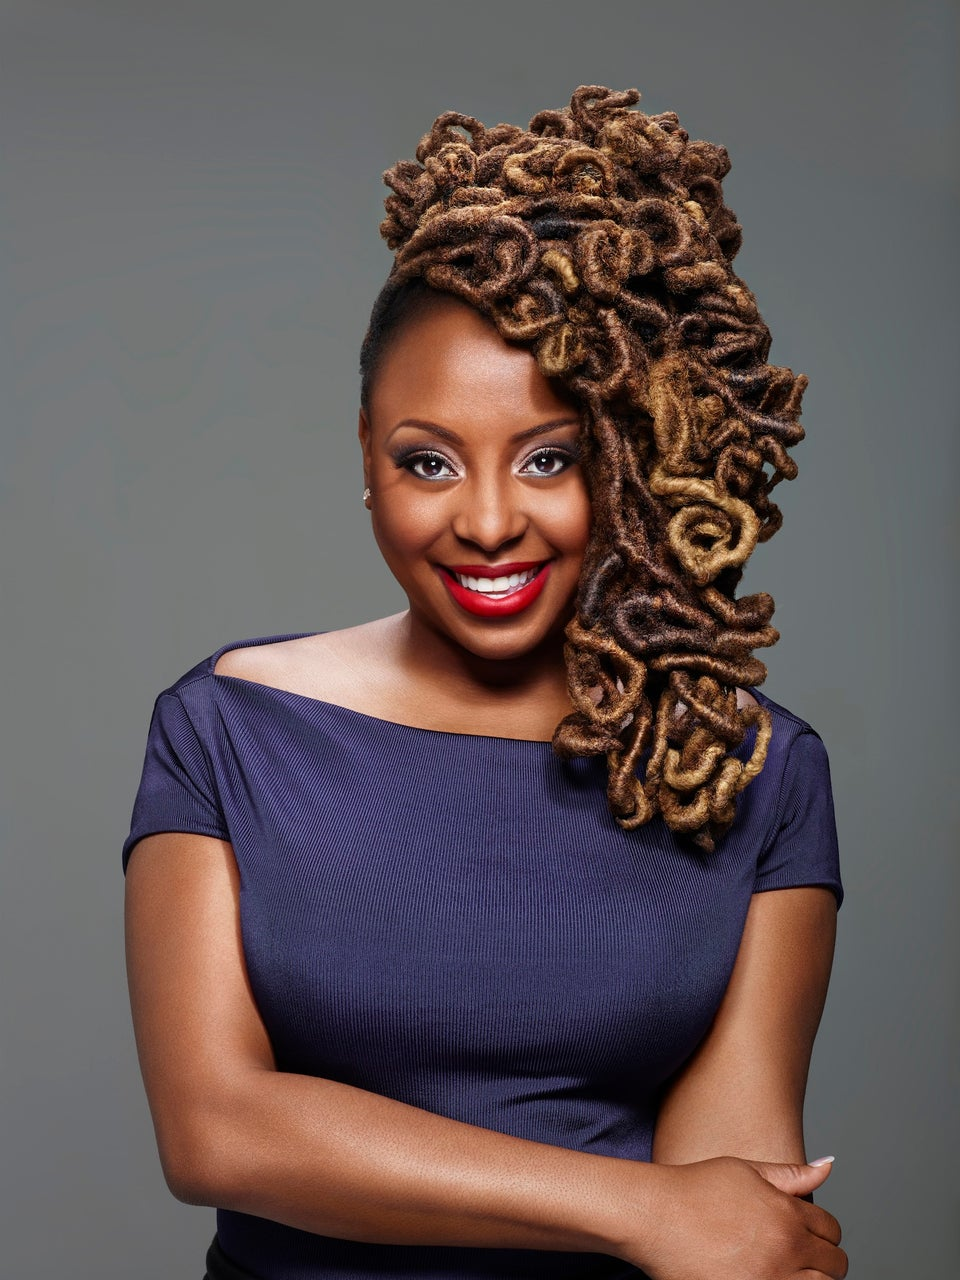 Design Essentials Natural Names Ledisi as First Beauty Ambassador